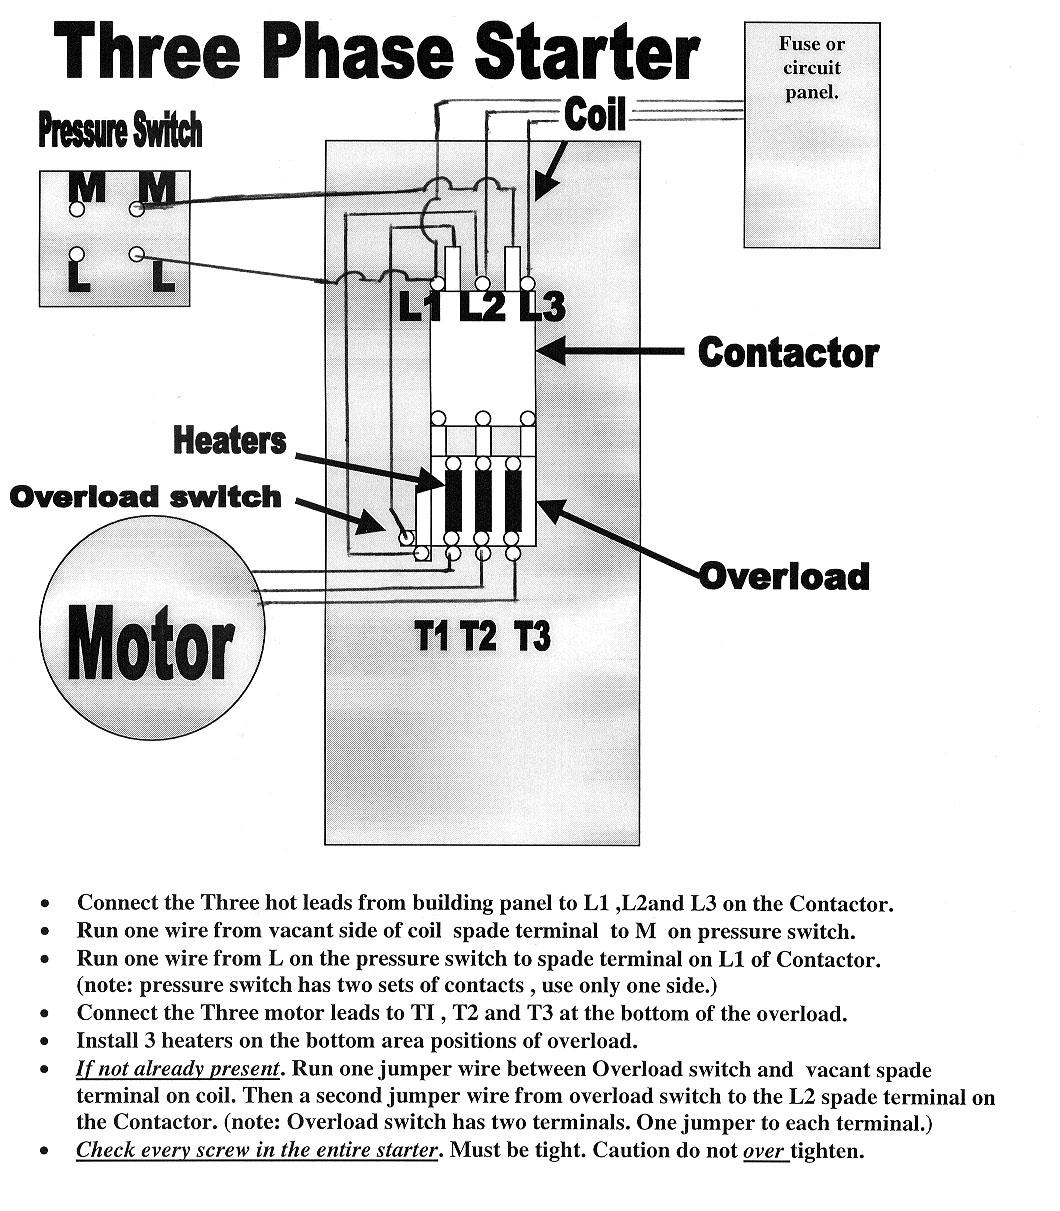 hight resolution of square d nema 1 starter wiring diagram square d motor starter wiring diagram